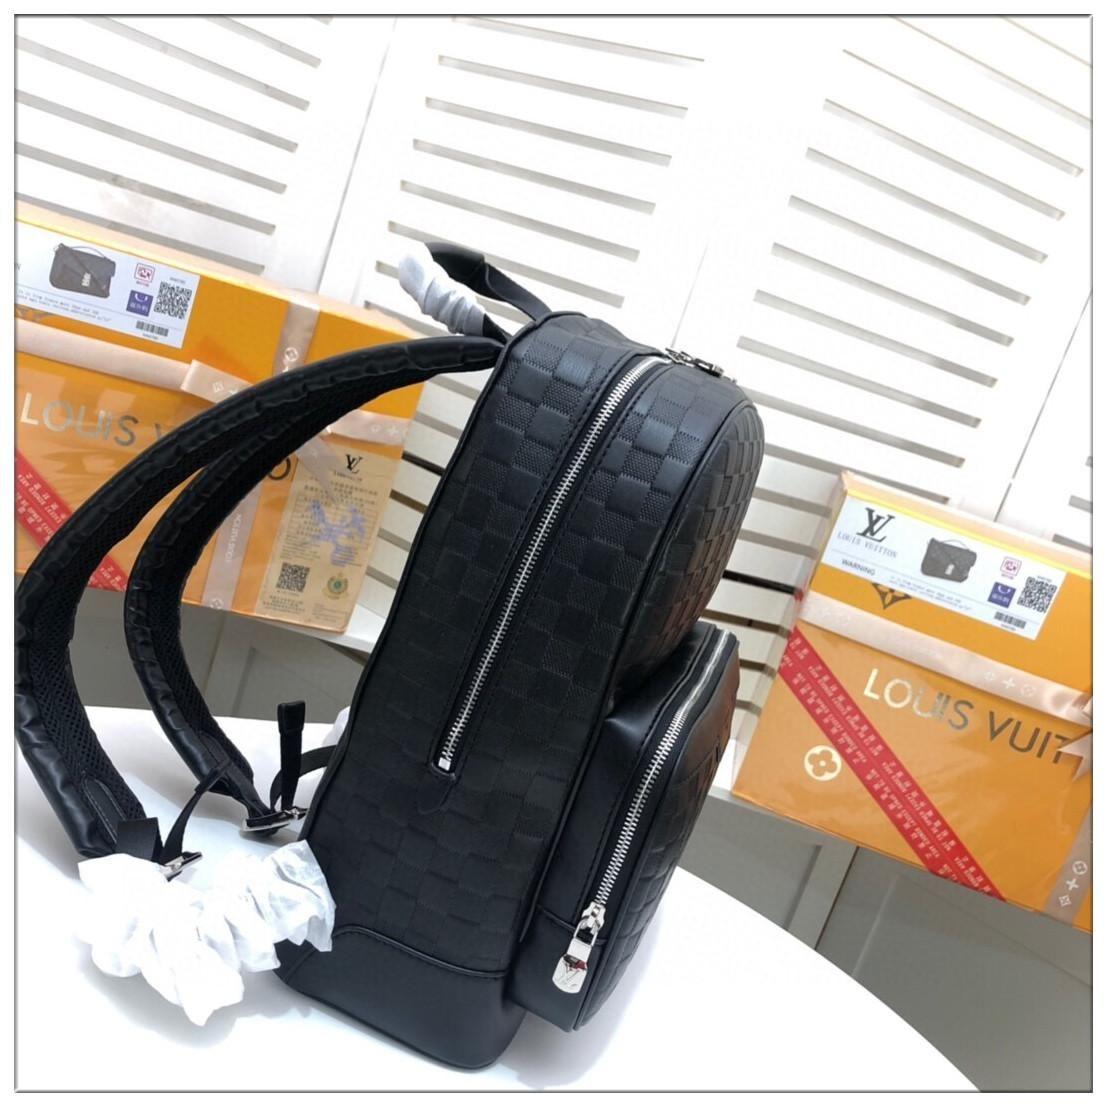 2020 Alta Qualidade Laptop Backpack Negócios Mochila Anti Theft Homens Backbag viagem Daypacks Masculino Lazer Mochila Mochila